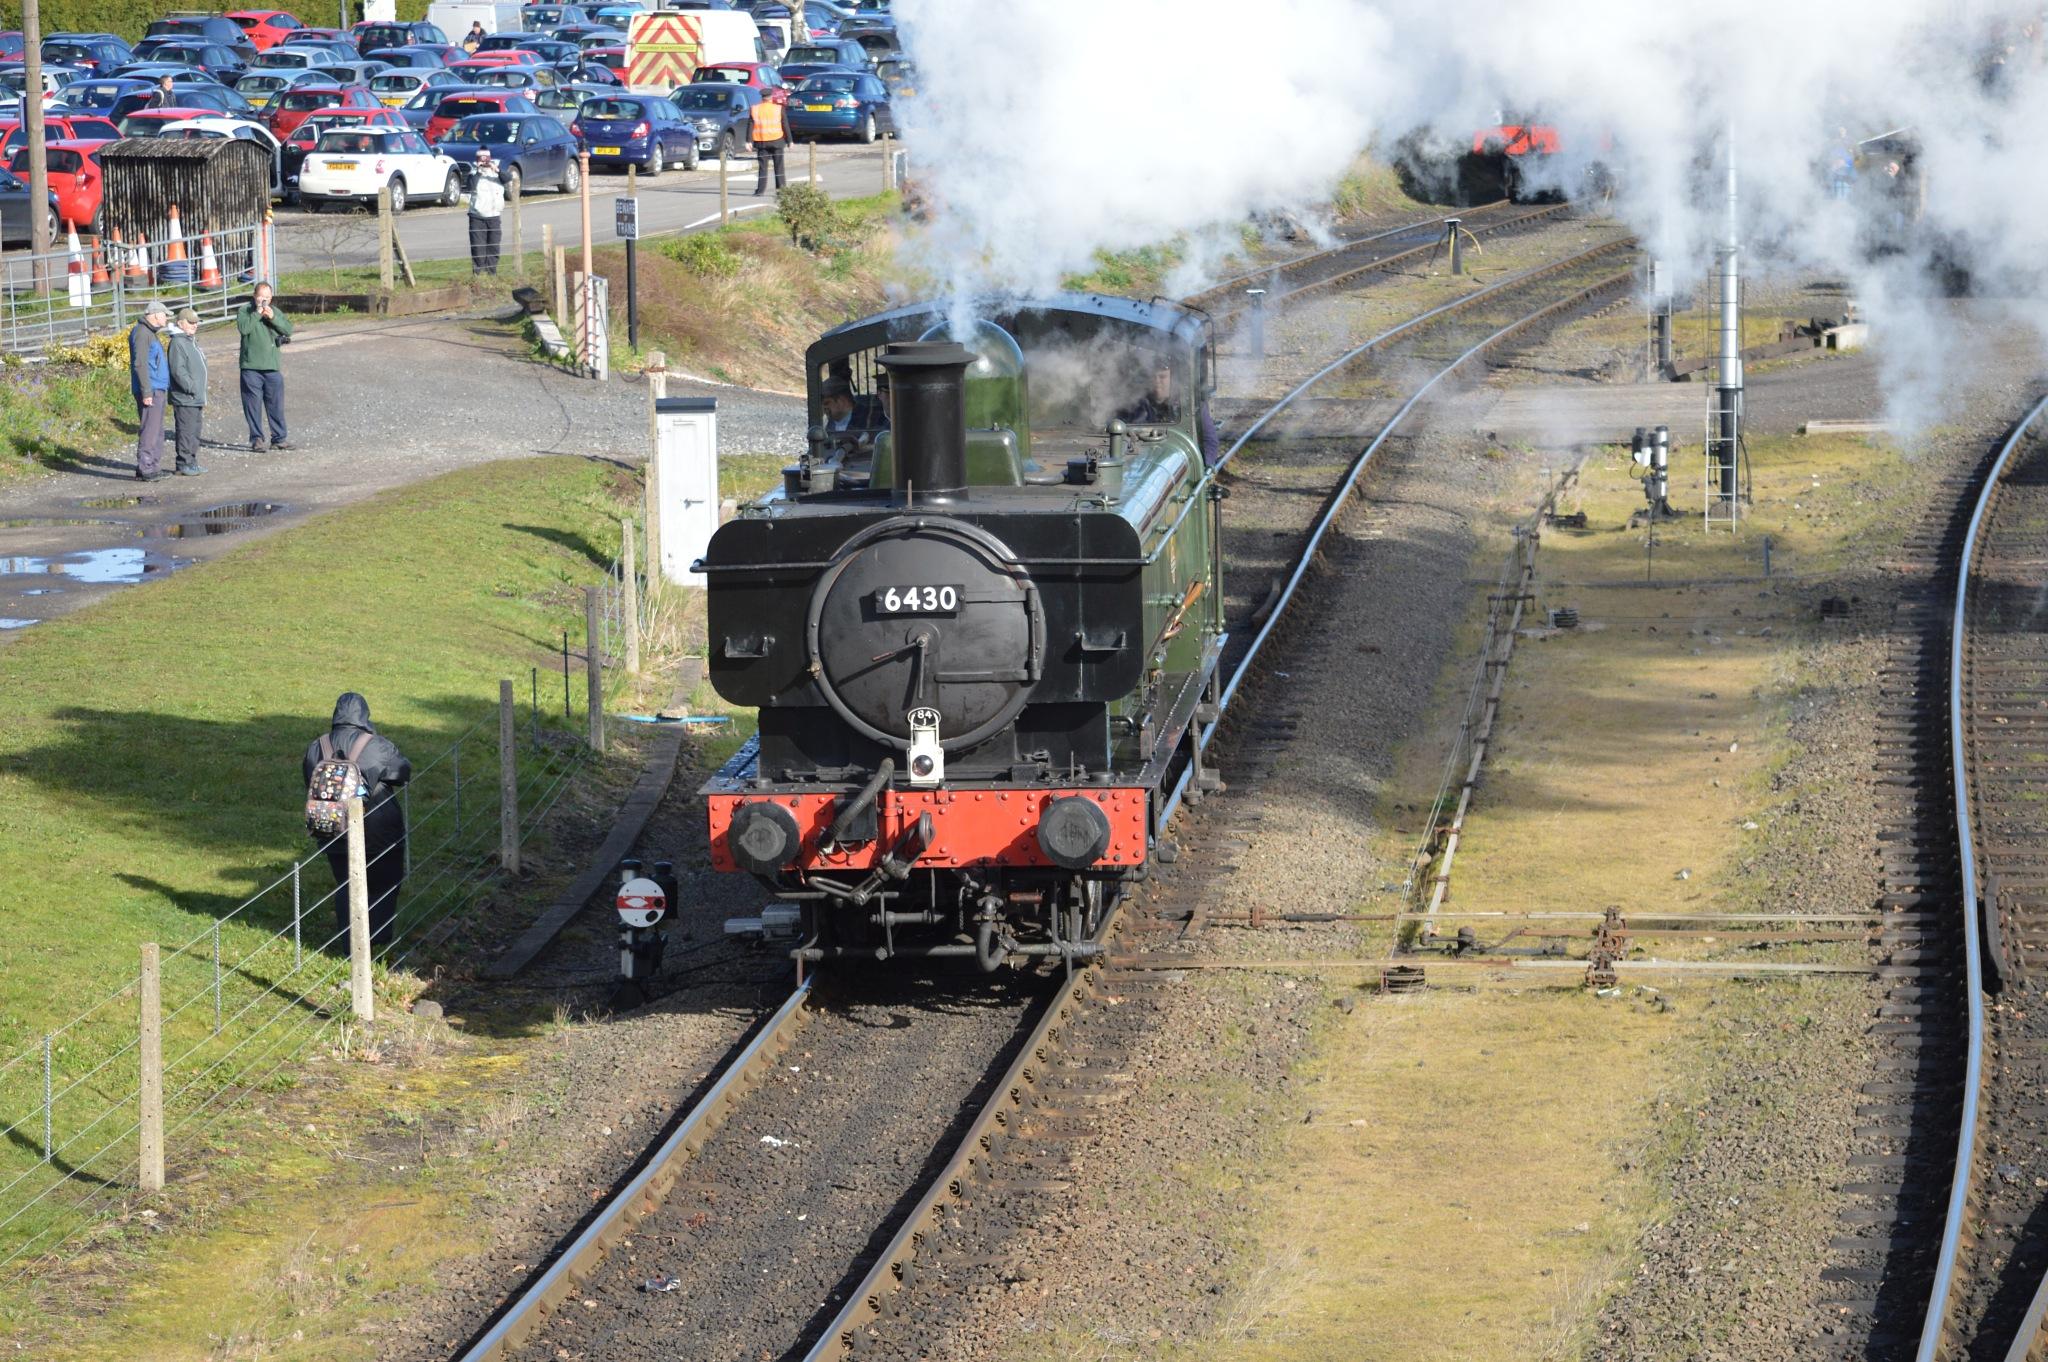 run around train by adrian.williams.58323